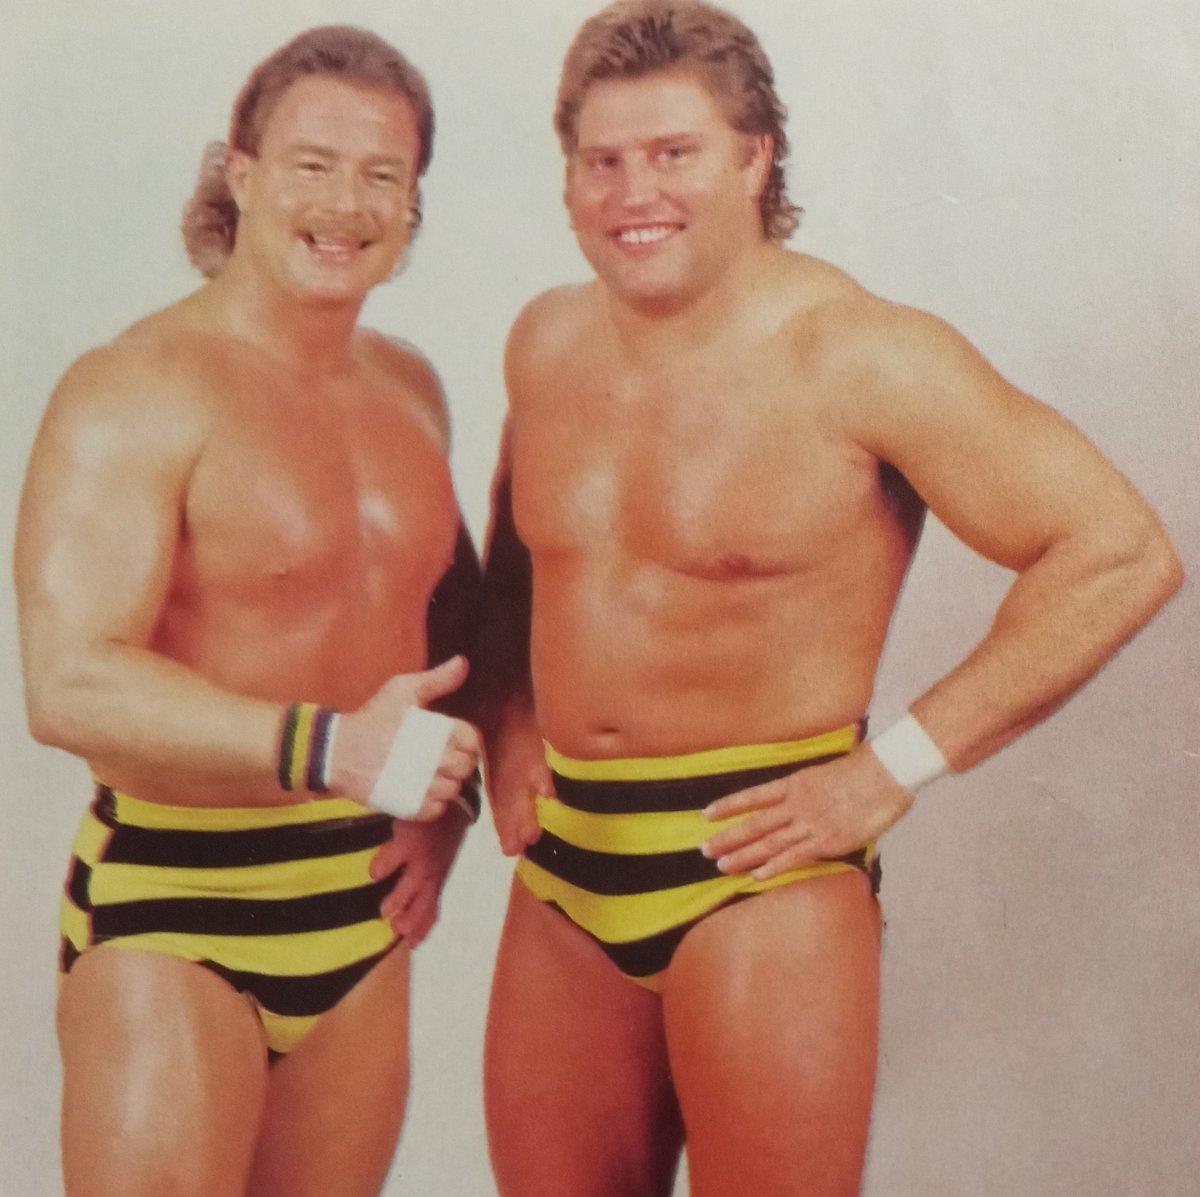 "Rasslin' History 101 on Twitter: ""B.Brian Blair and Jumping Jim Brunzell:the high-flying Killer Bees circa-1987… """